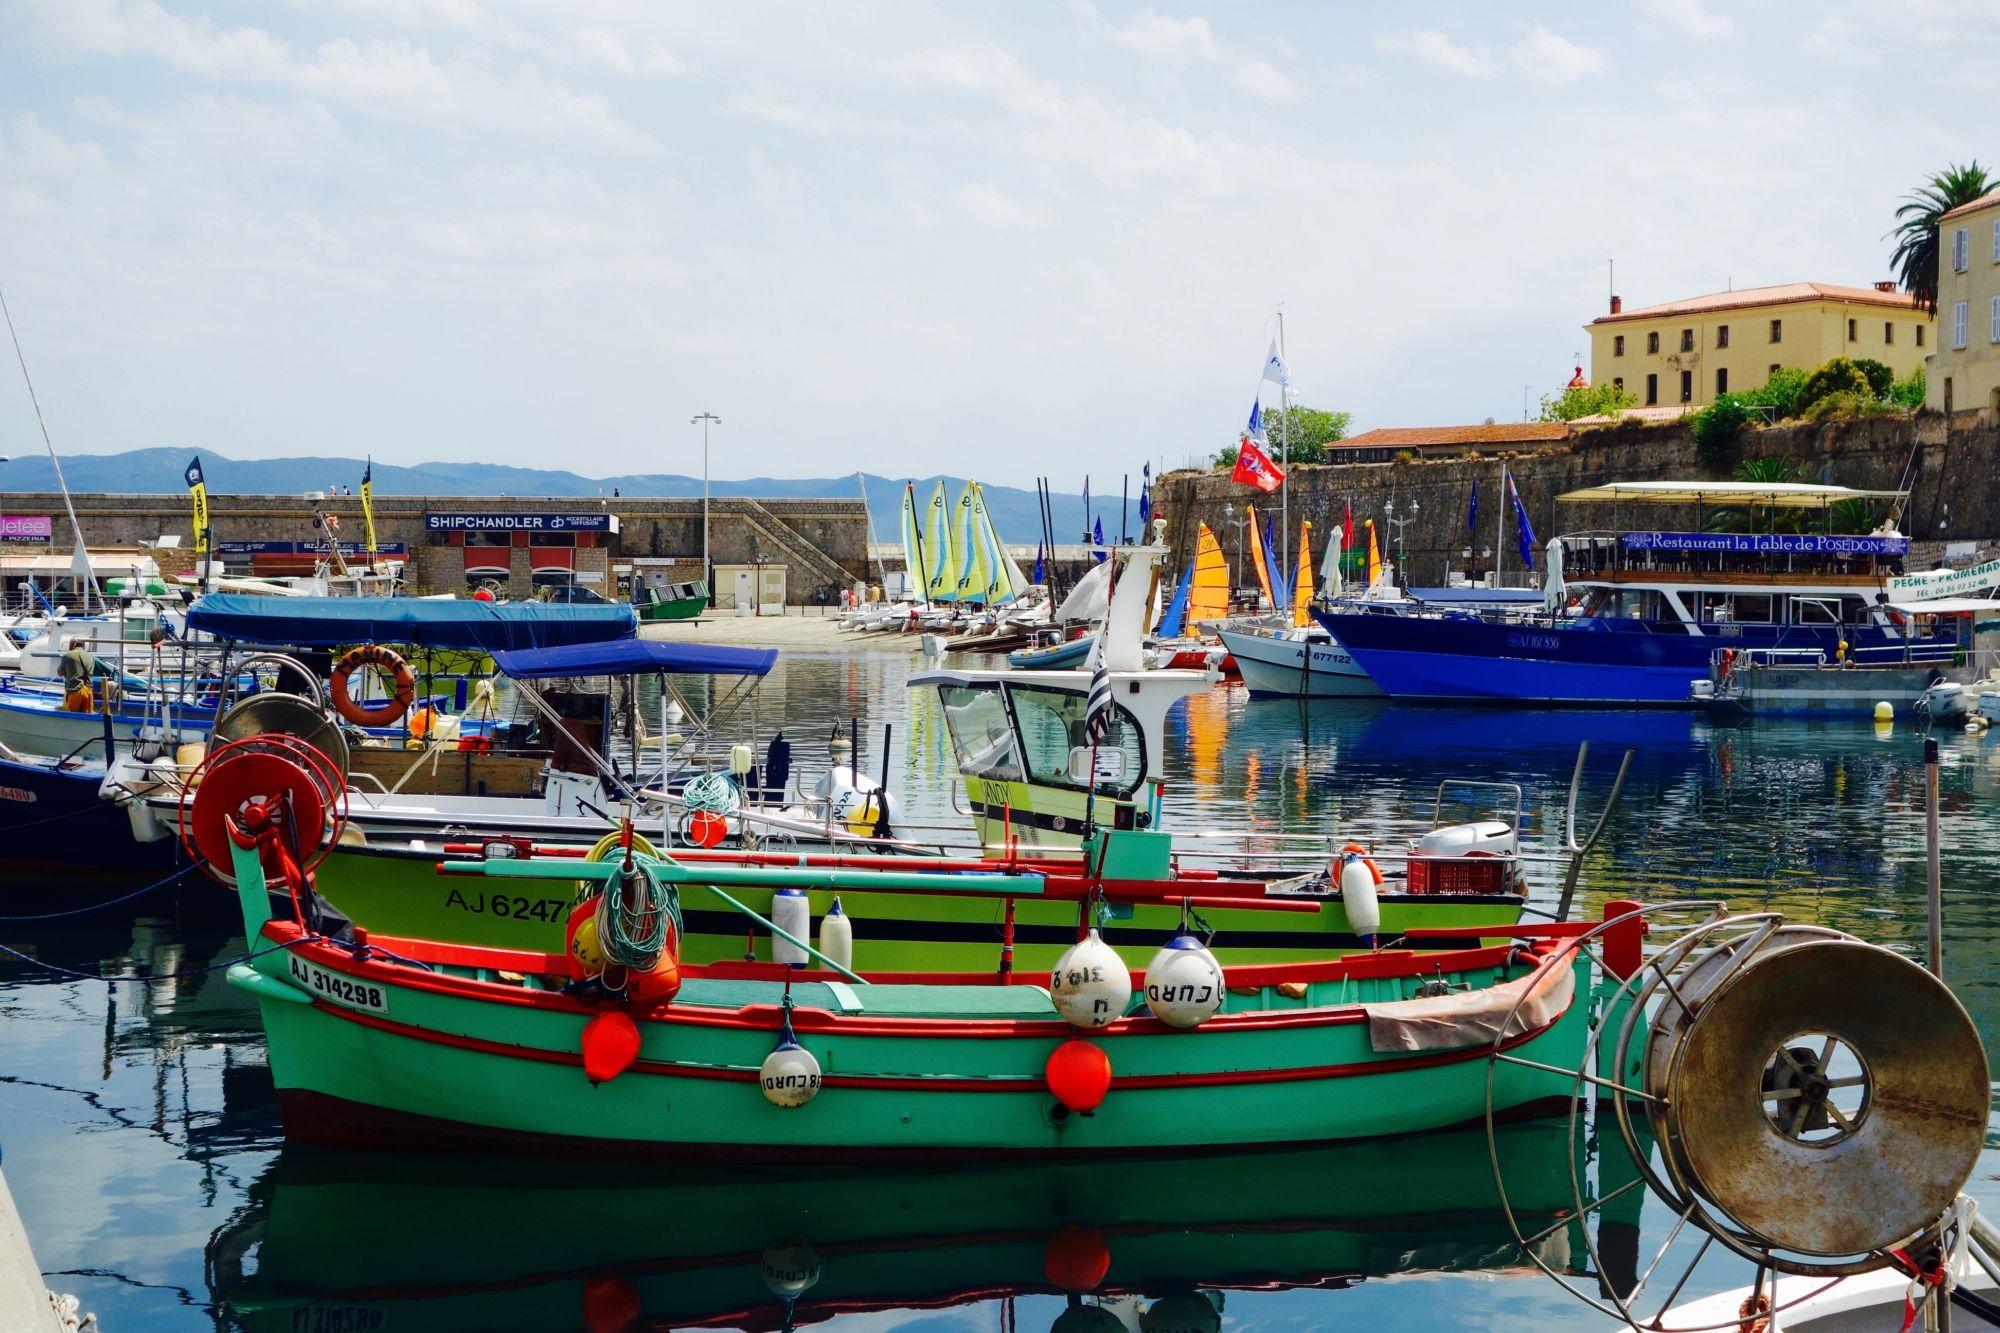 1607_vacances_corse_ajaccio_sanguinaires_2